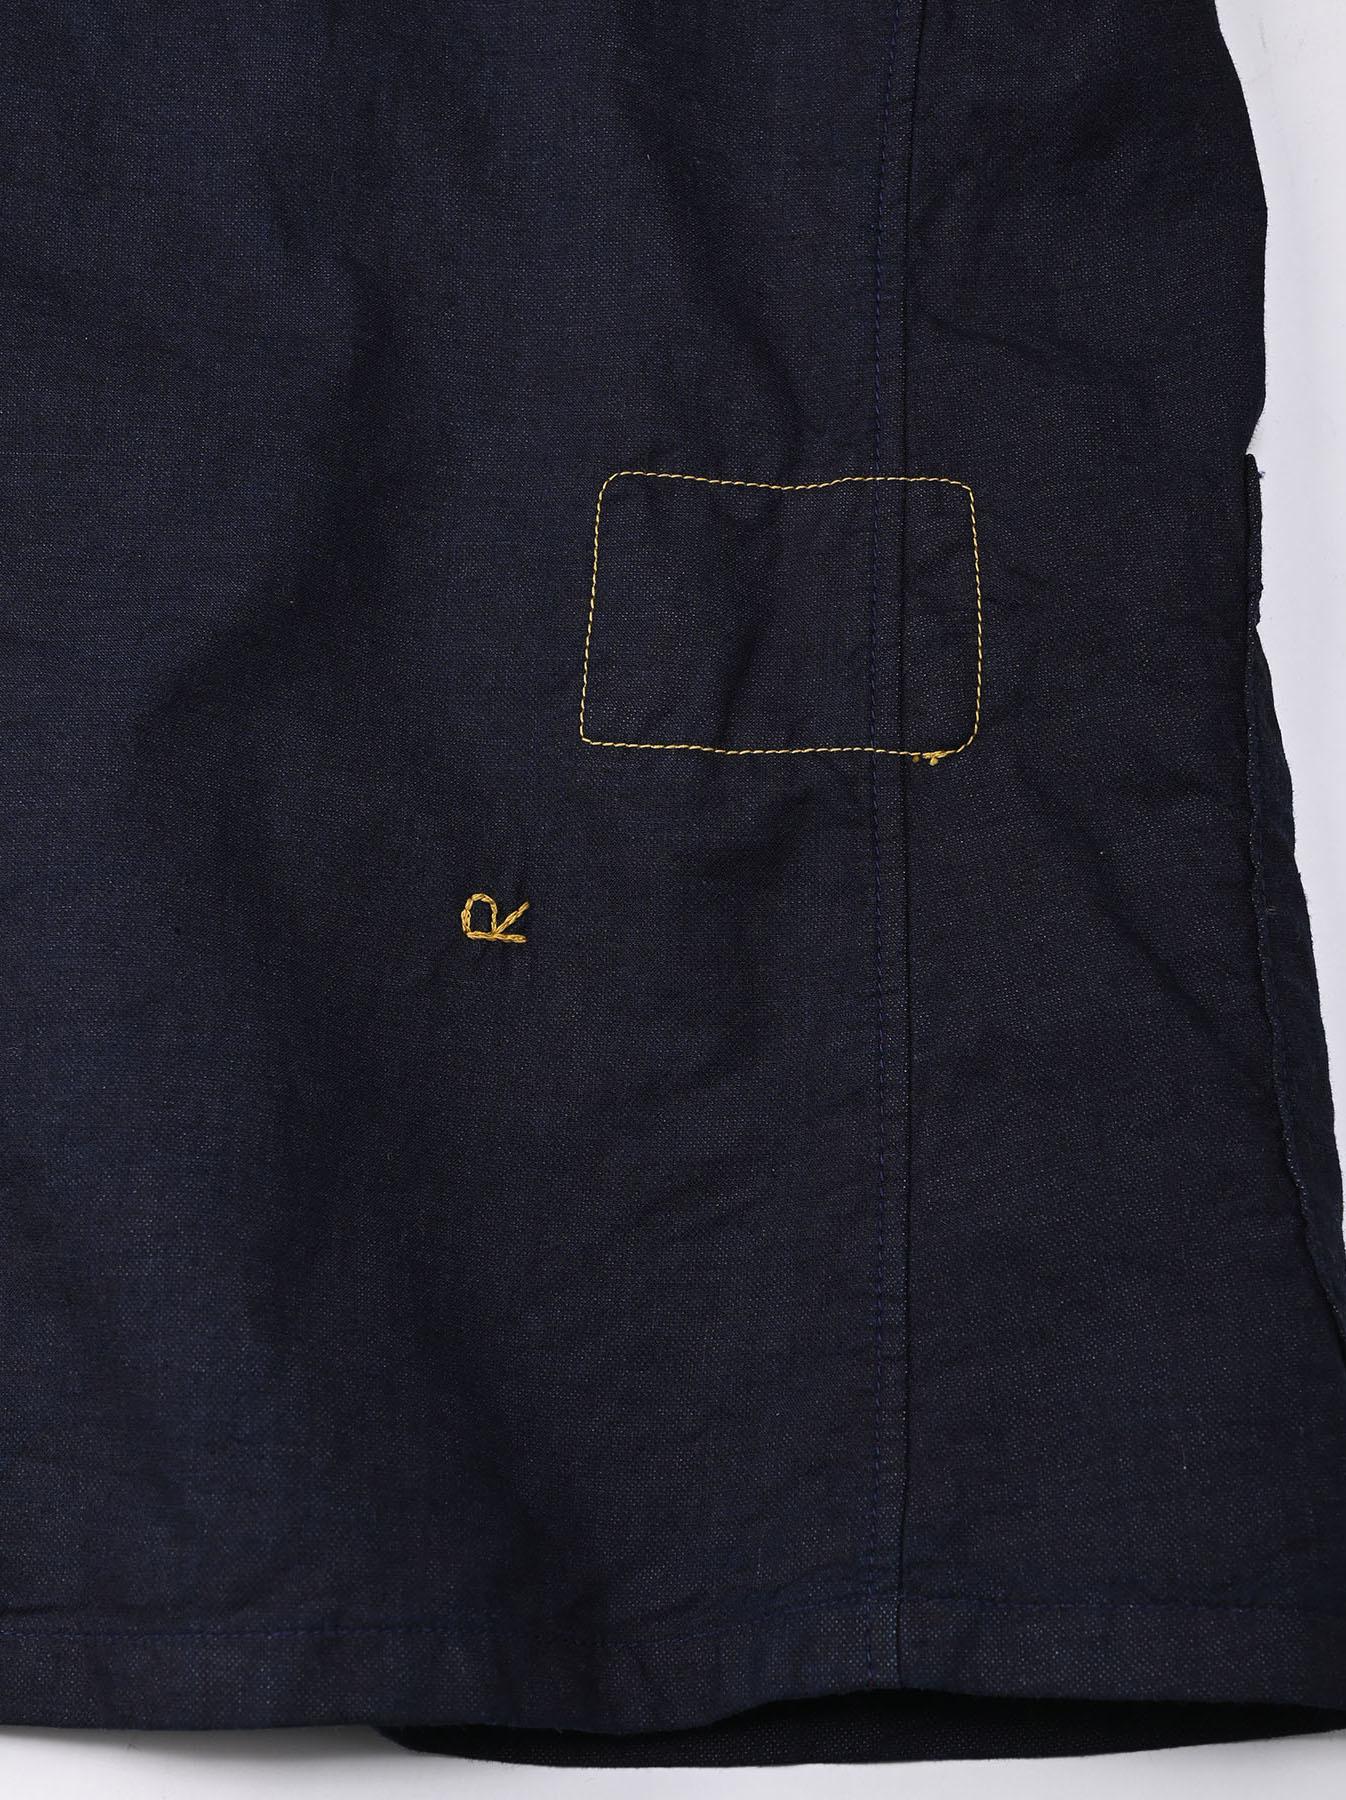 Indigo Double Woven 908 Shirt Jacket (0421)-10